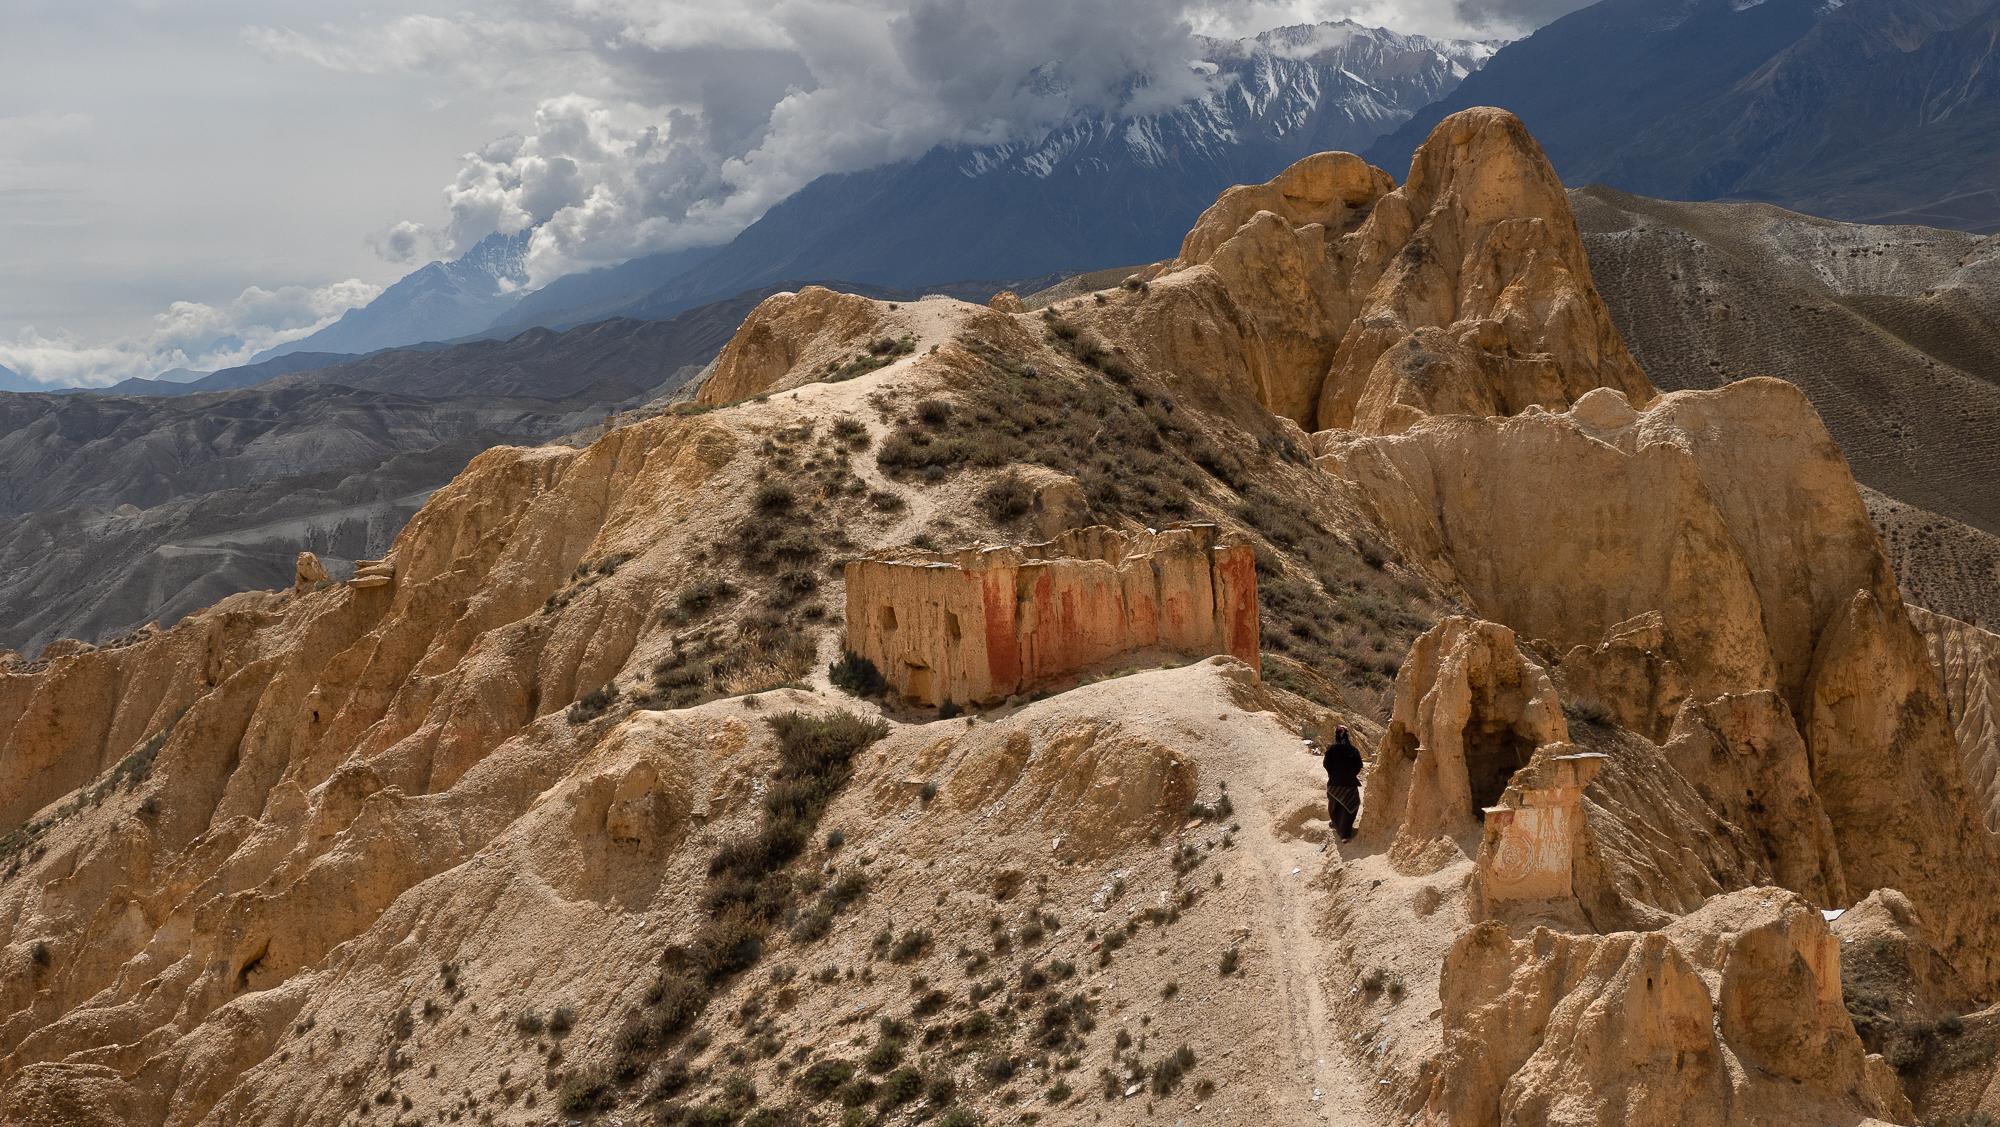 Going to Konchok Ling, Nepal